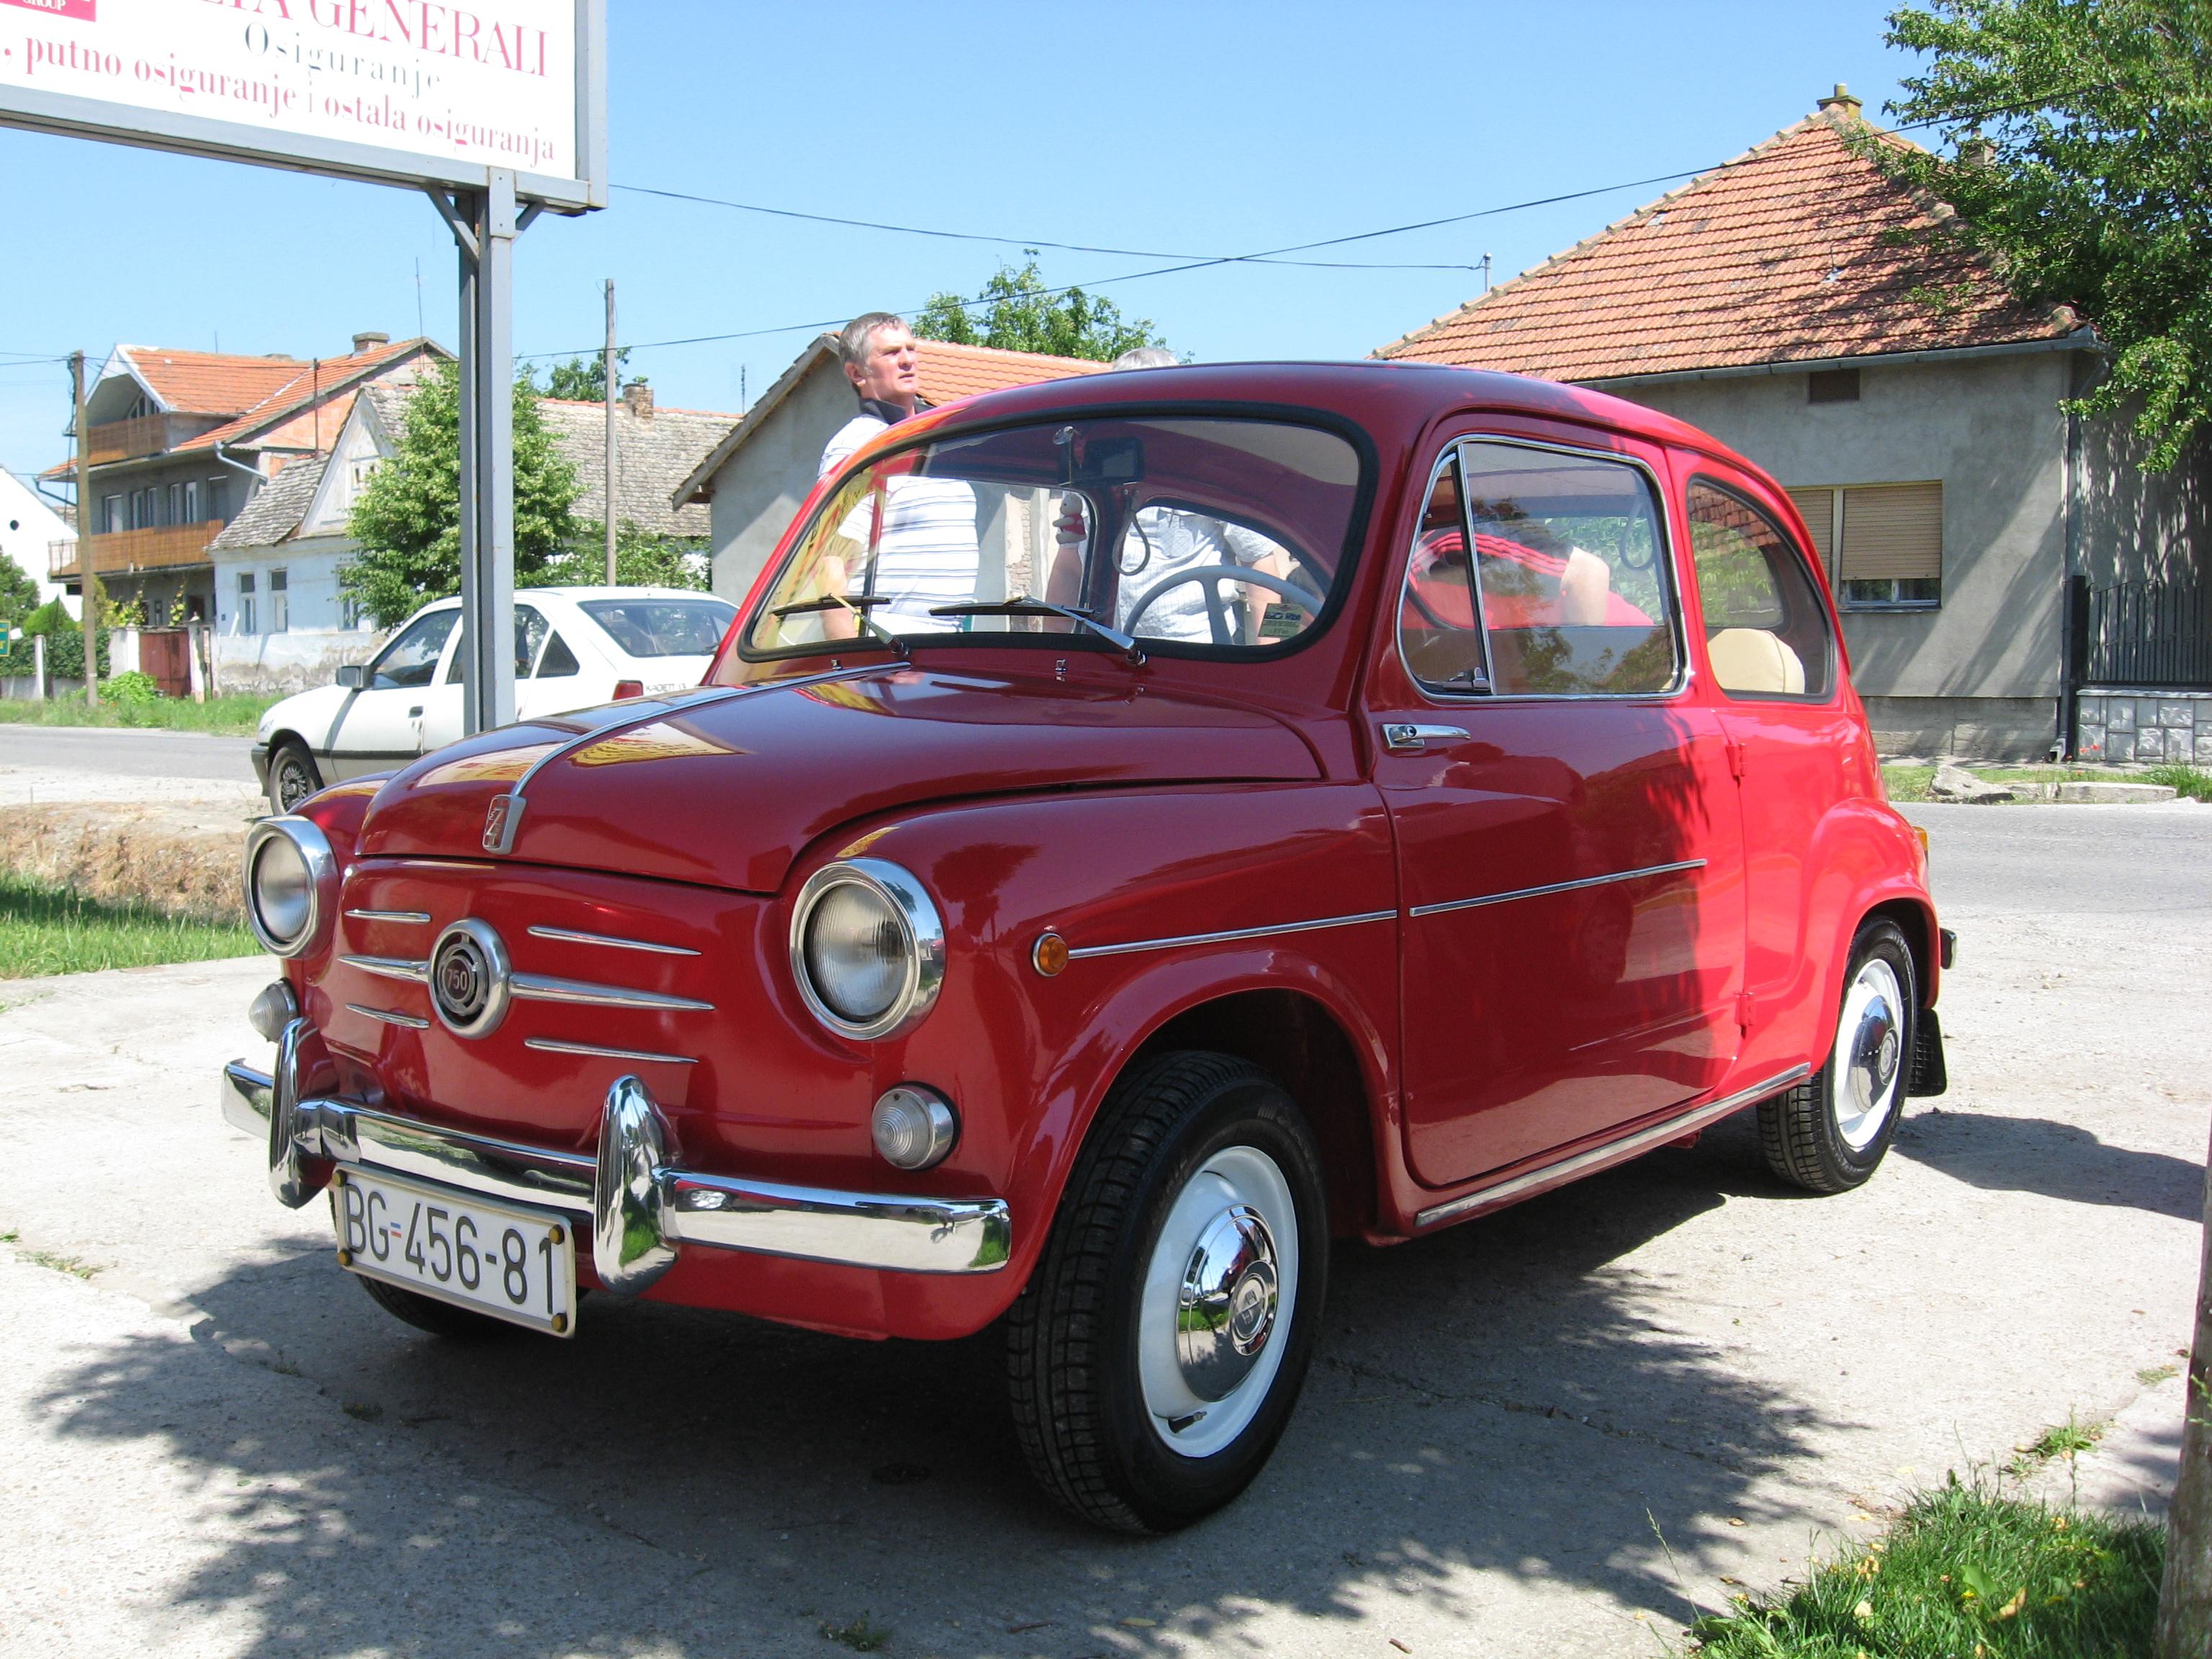 Amazing Zastava 750 Pictures & Backgrounds